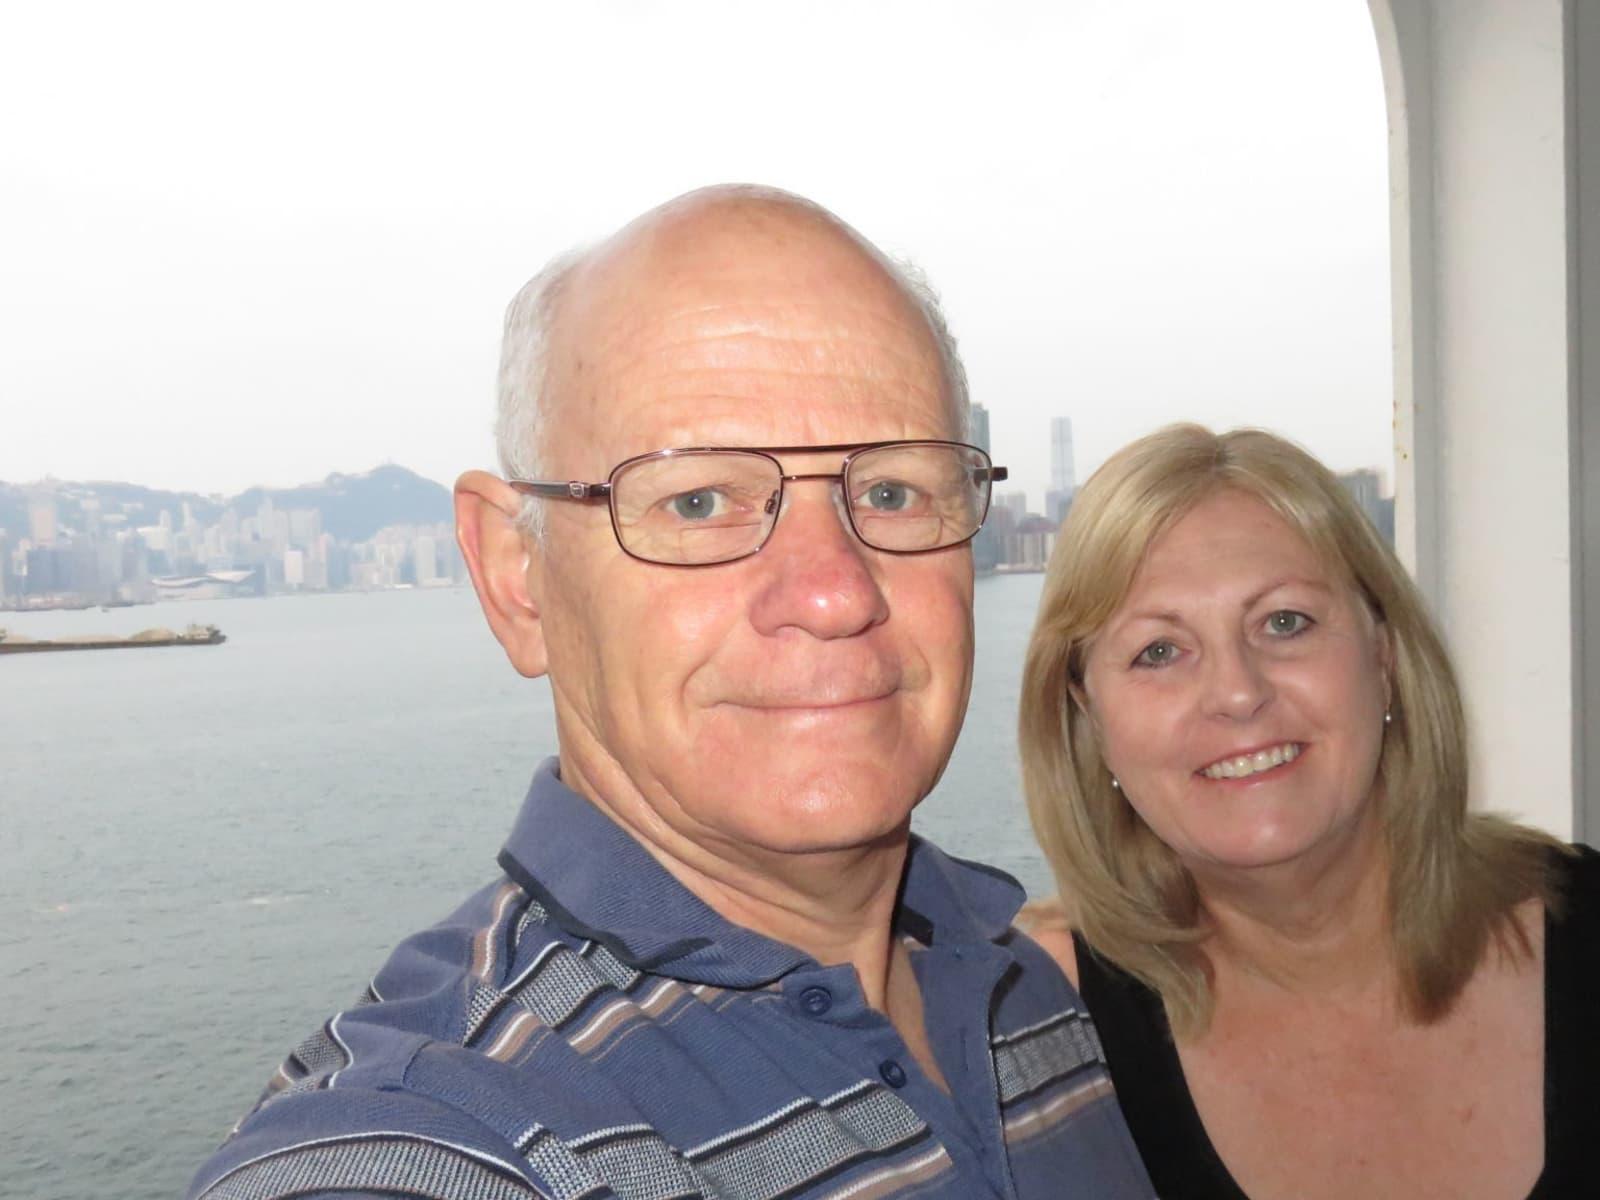 Gary & Angela from Tweed Heads, New South Wales, Australia